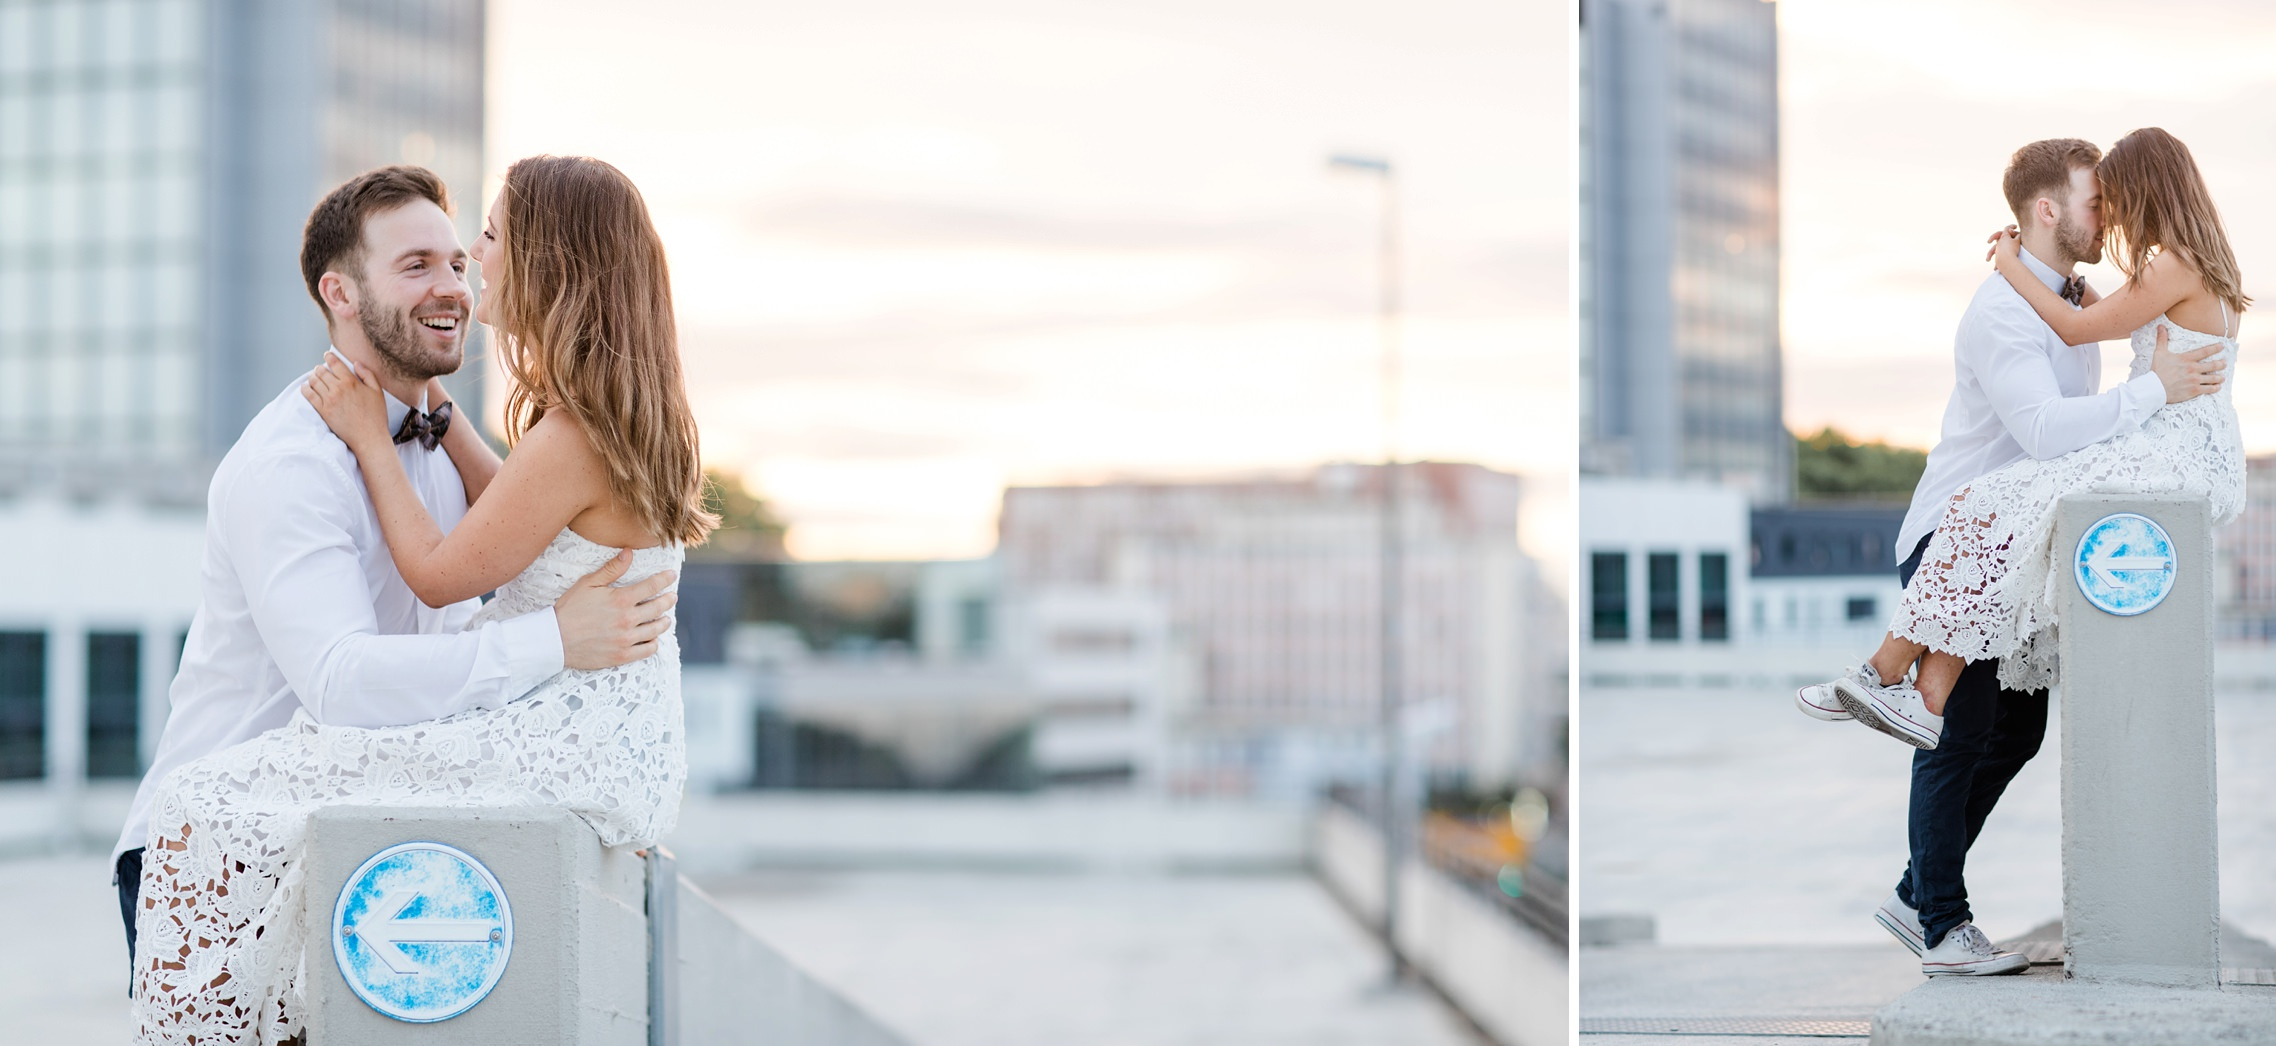 Romantisches Paar-Shooting Sonnenuntergang Parkdeck Ludwigshafen